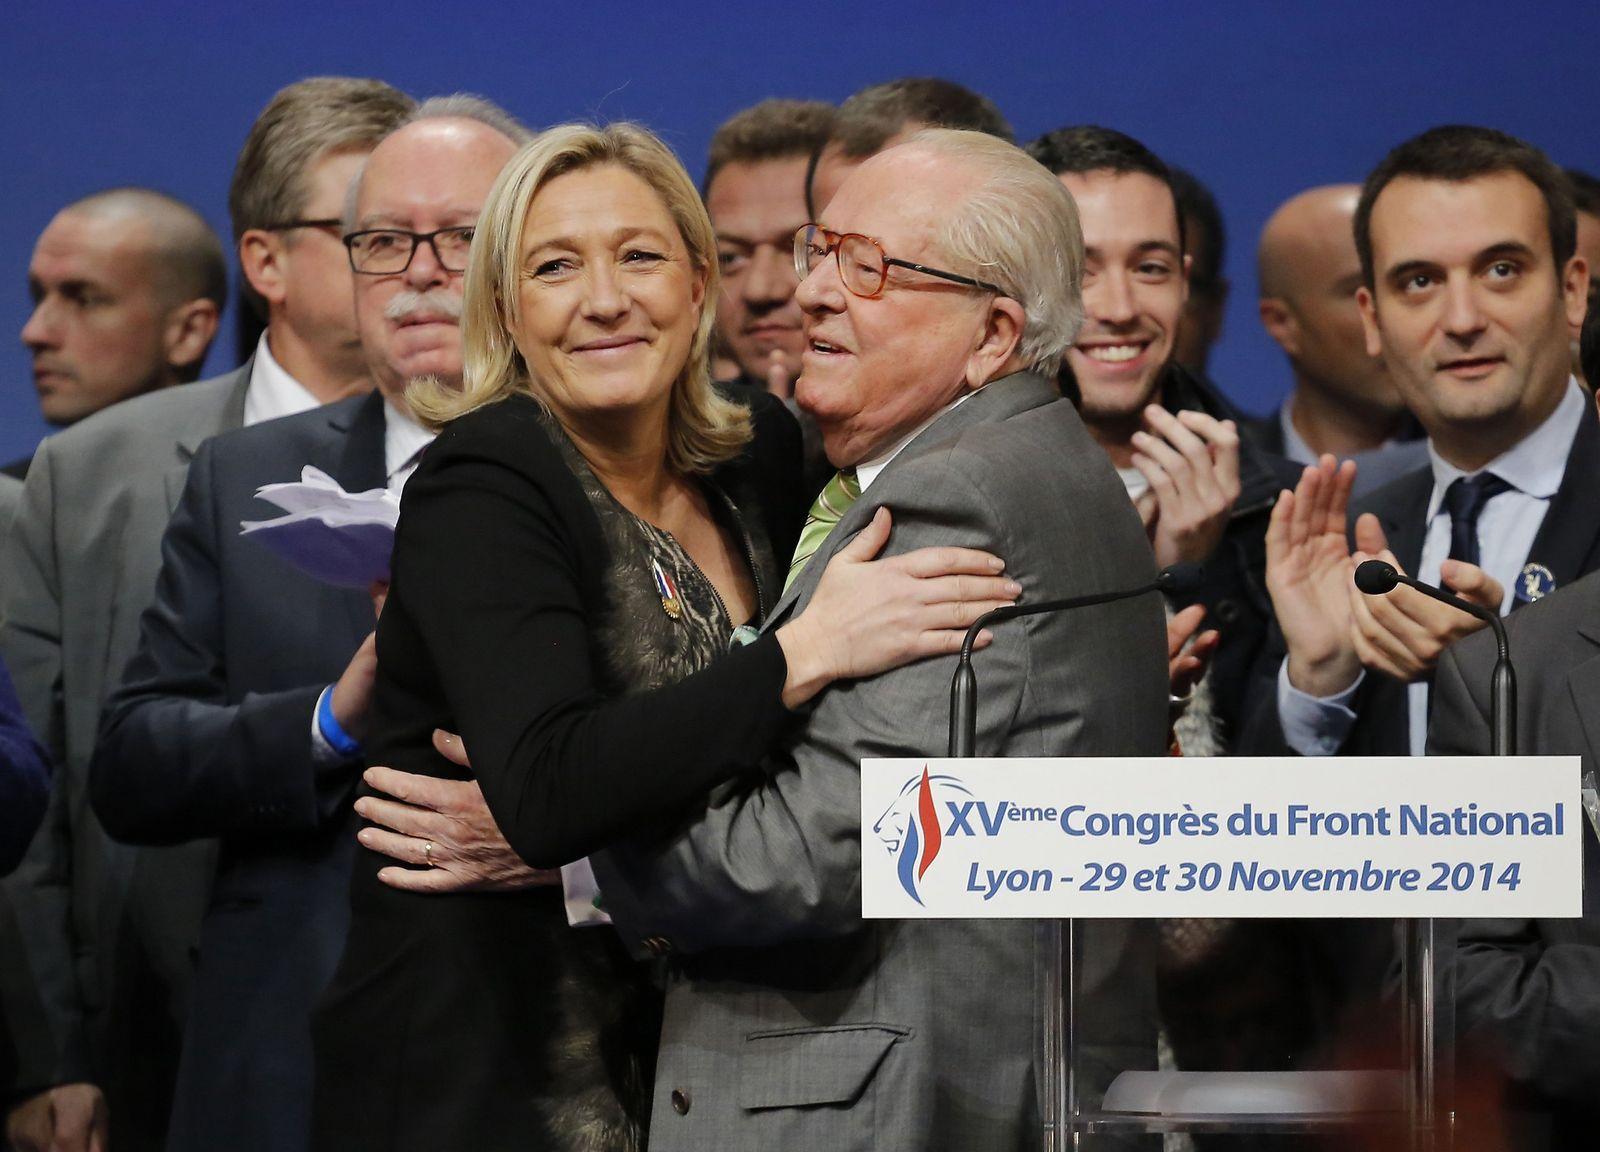 Jean-Marie Le Pen/ Marine Le Pen